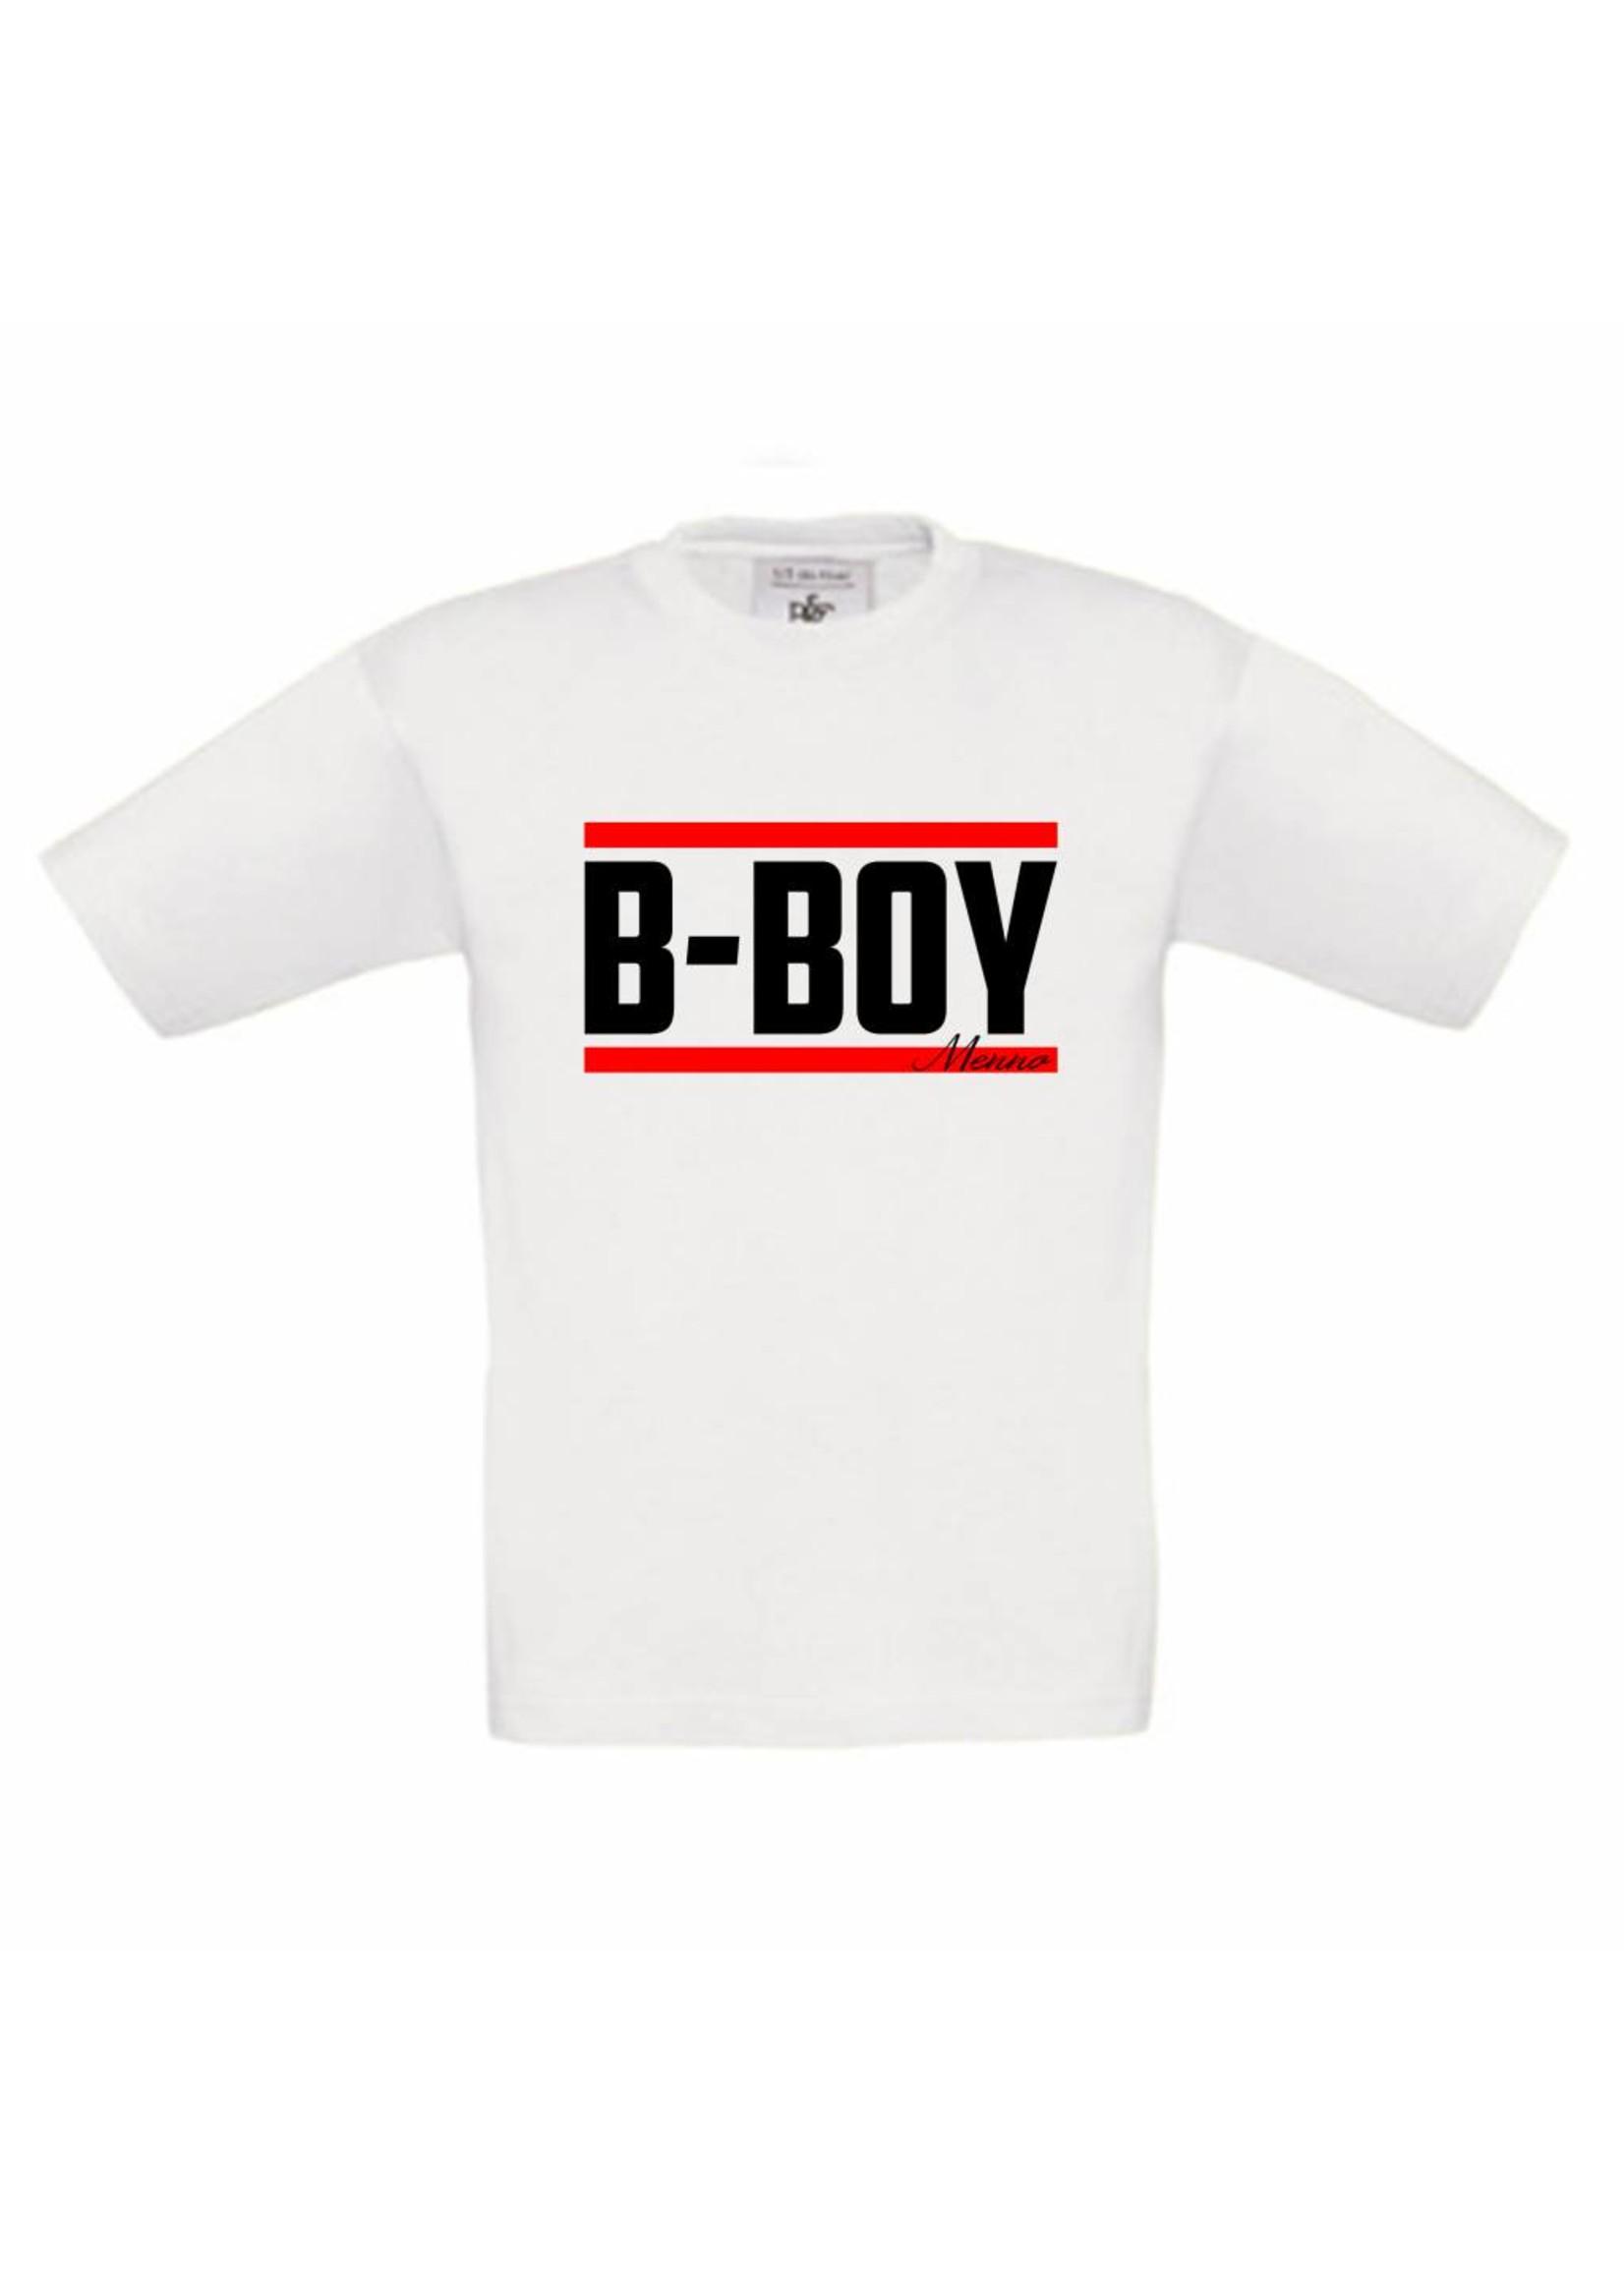 T-shirt B-boy met naam